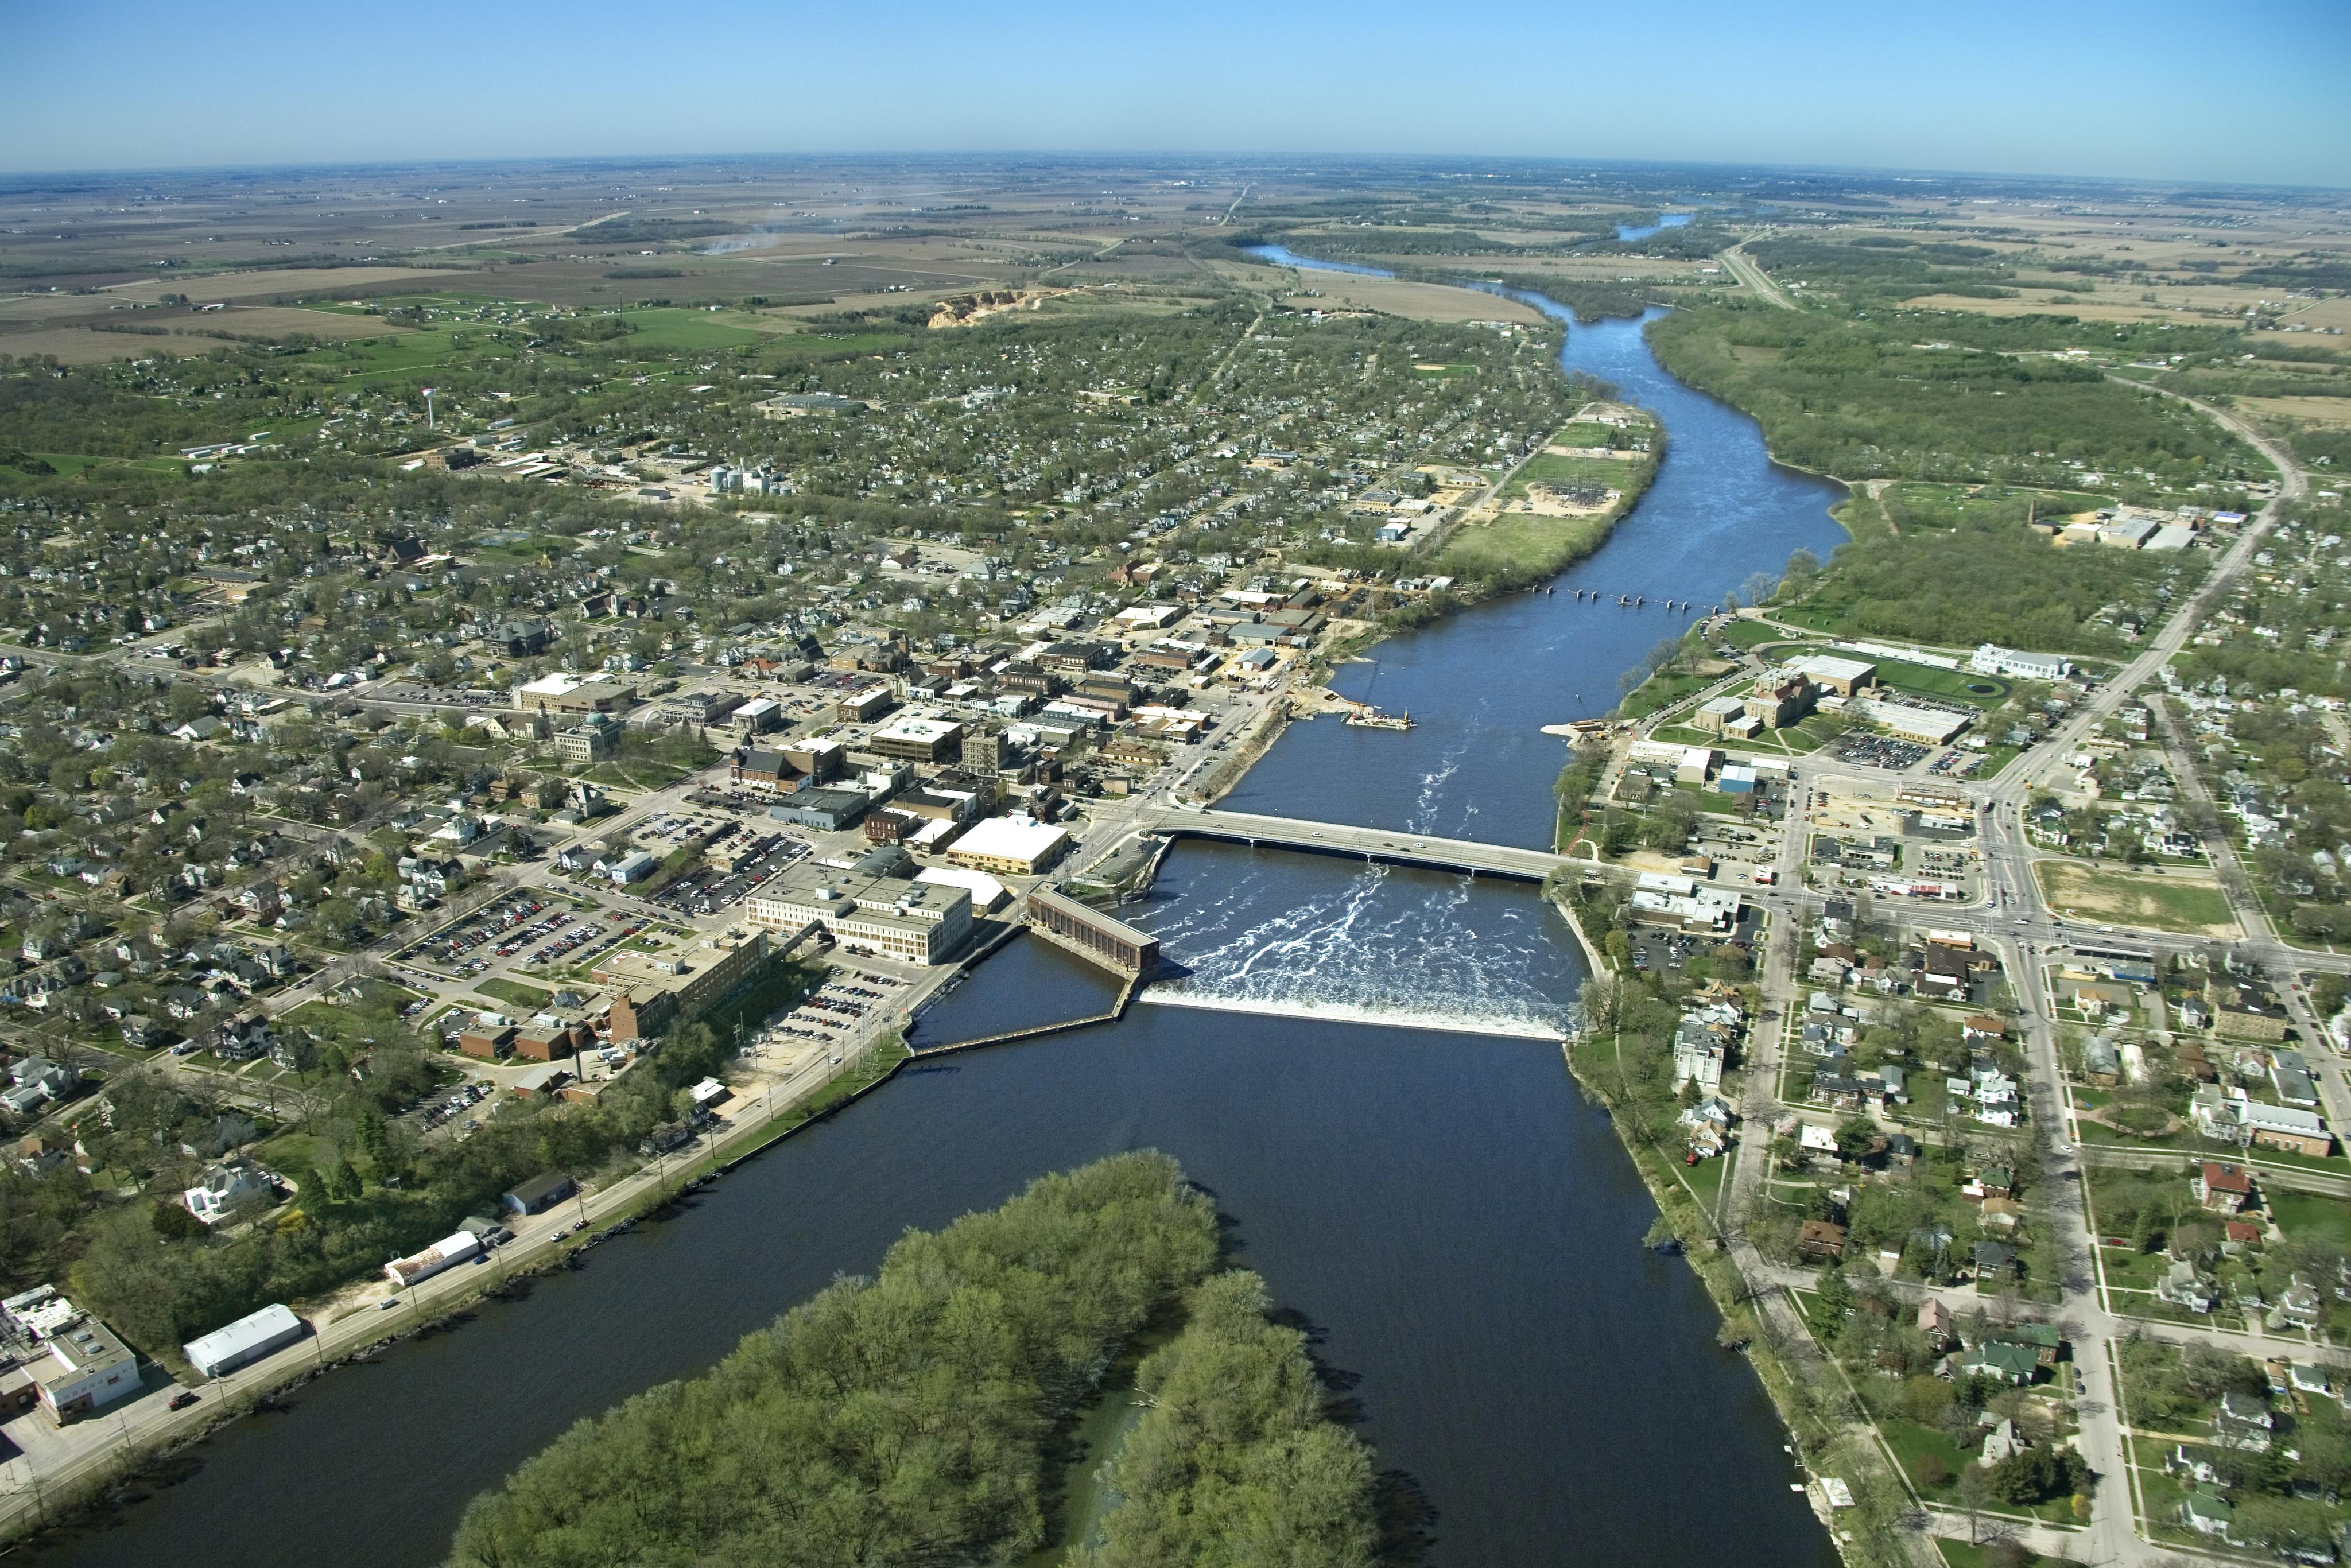 aerial-view-of-mississippi-river-iowa - Iowa Pictures - Iowa ...